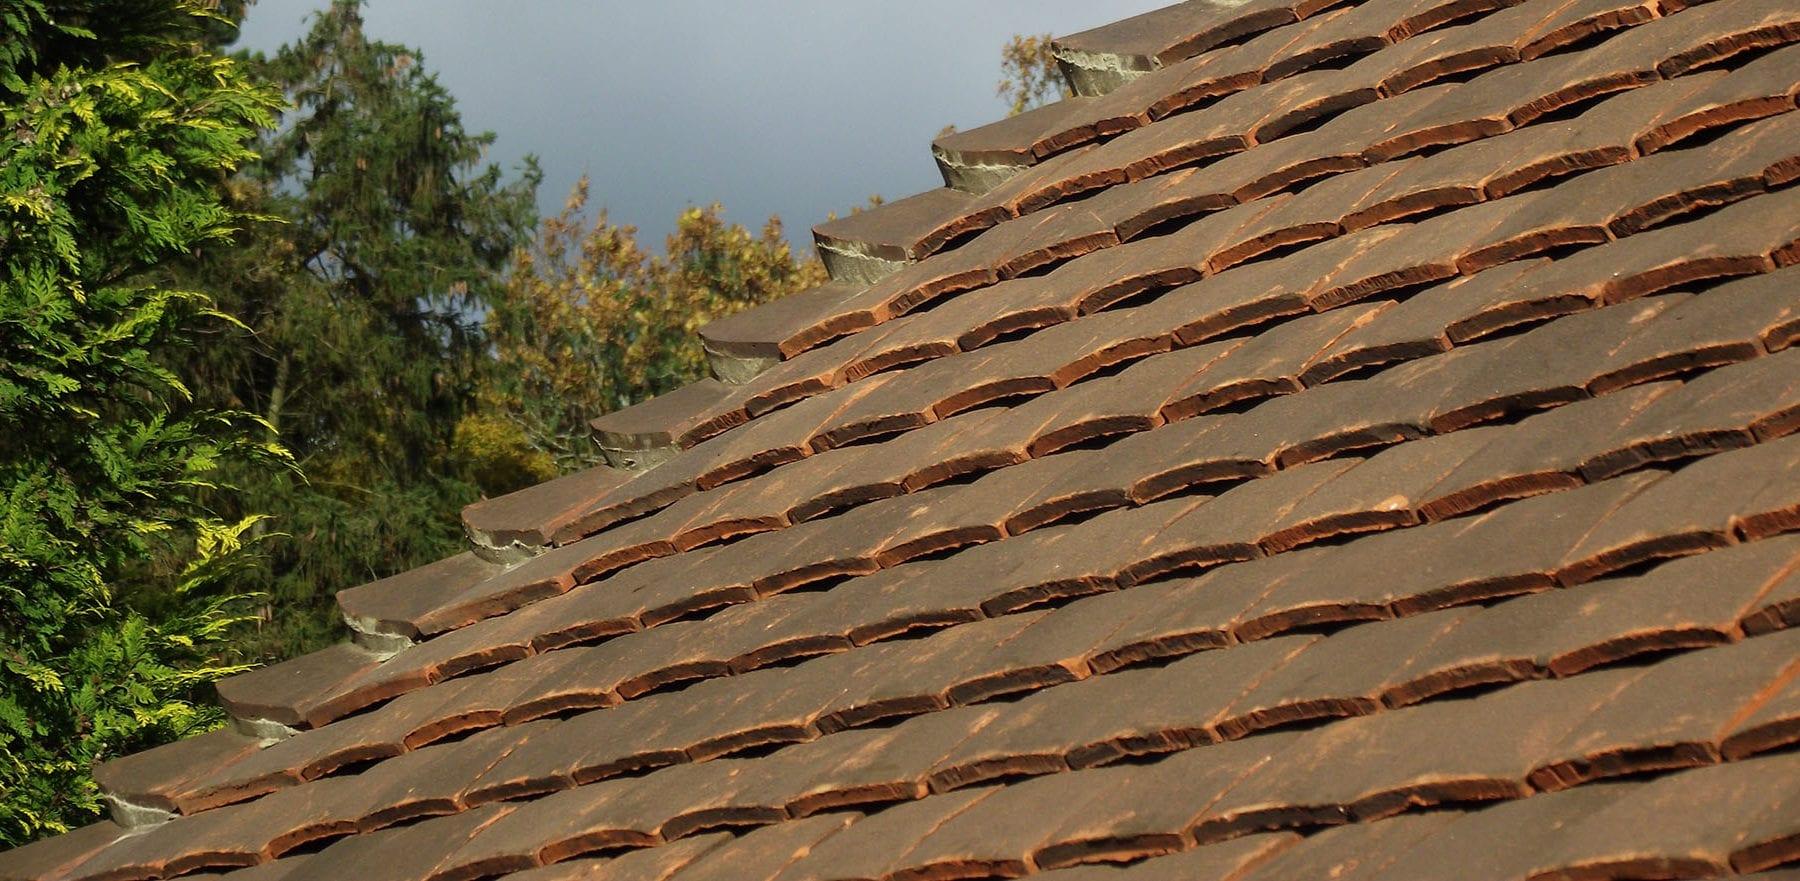 Lifestiles - Handmade Restoration Clay Roof Tiles - Seale, England 3